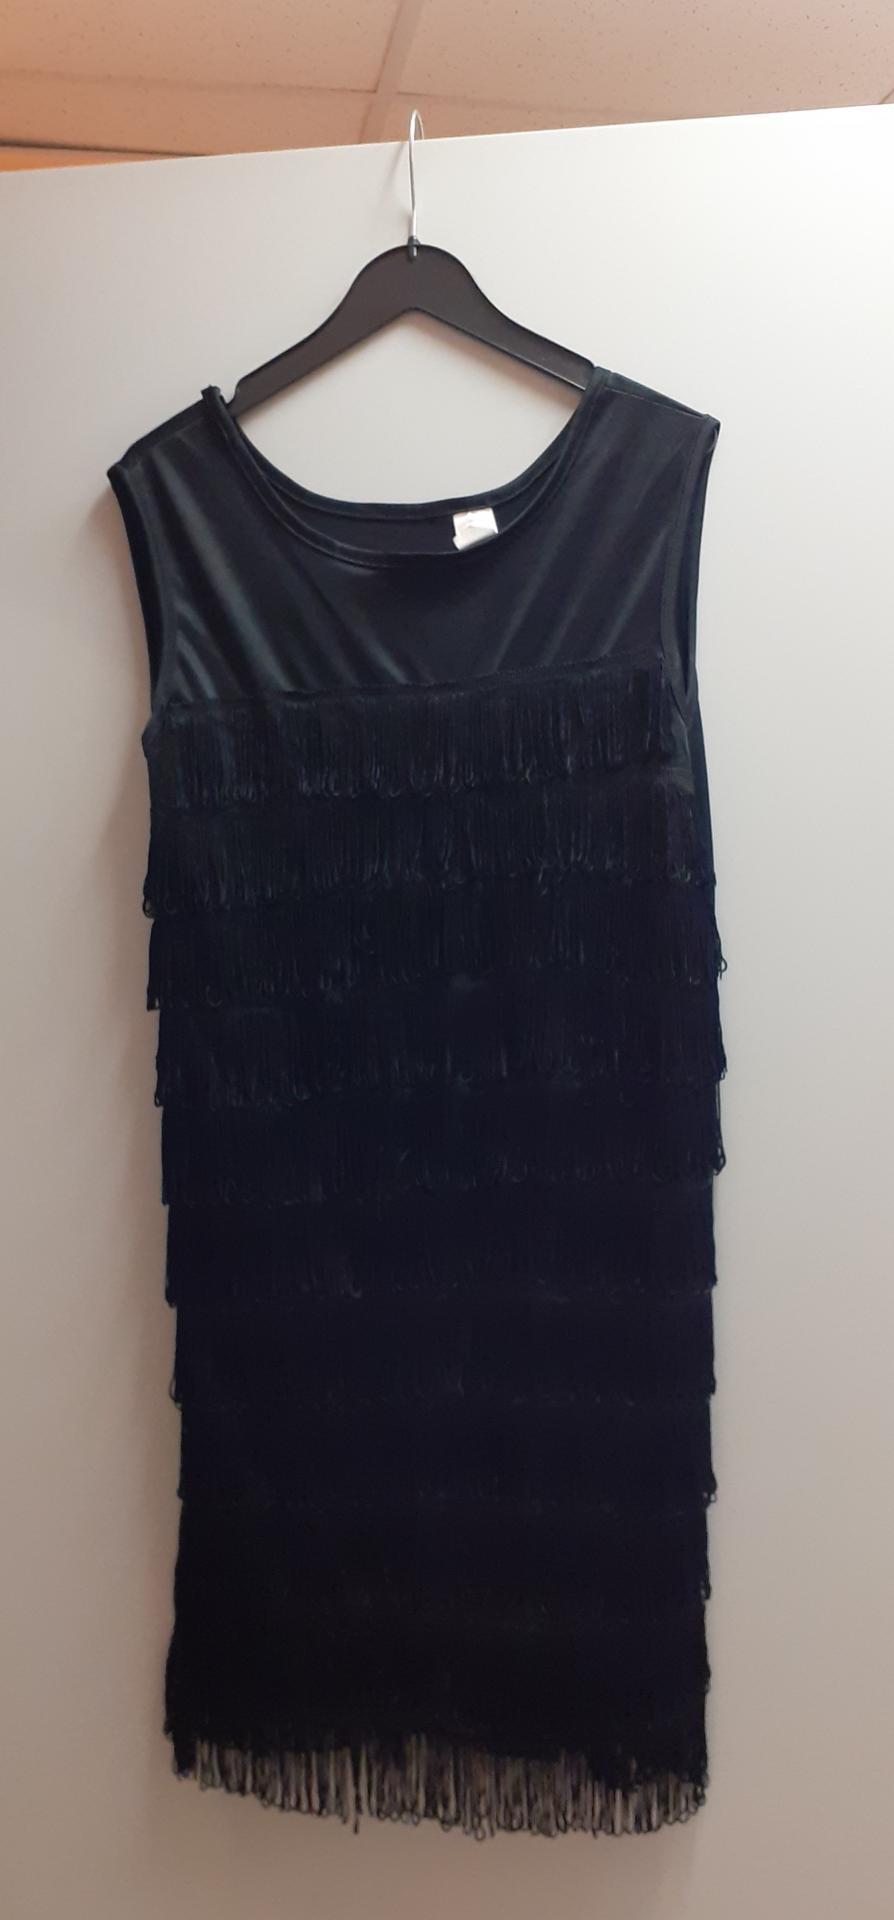 Robes charleston noires à froufrous 11-12 ans (x11)